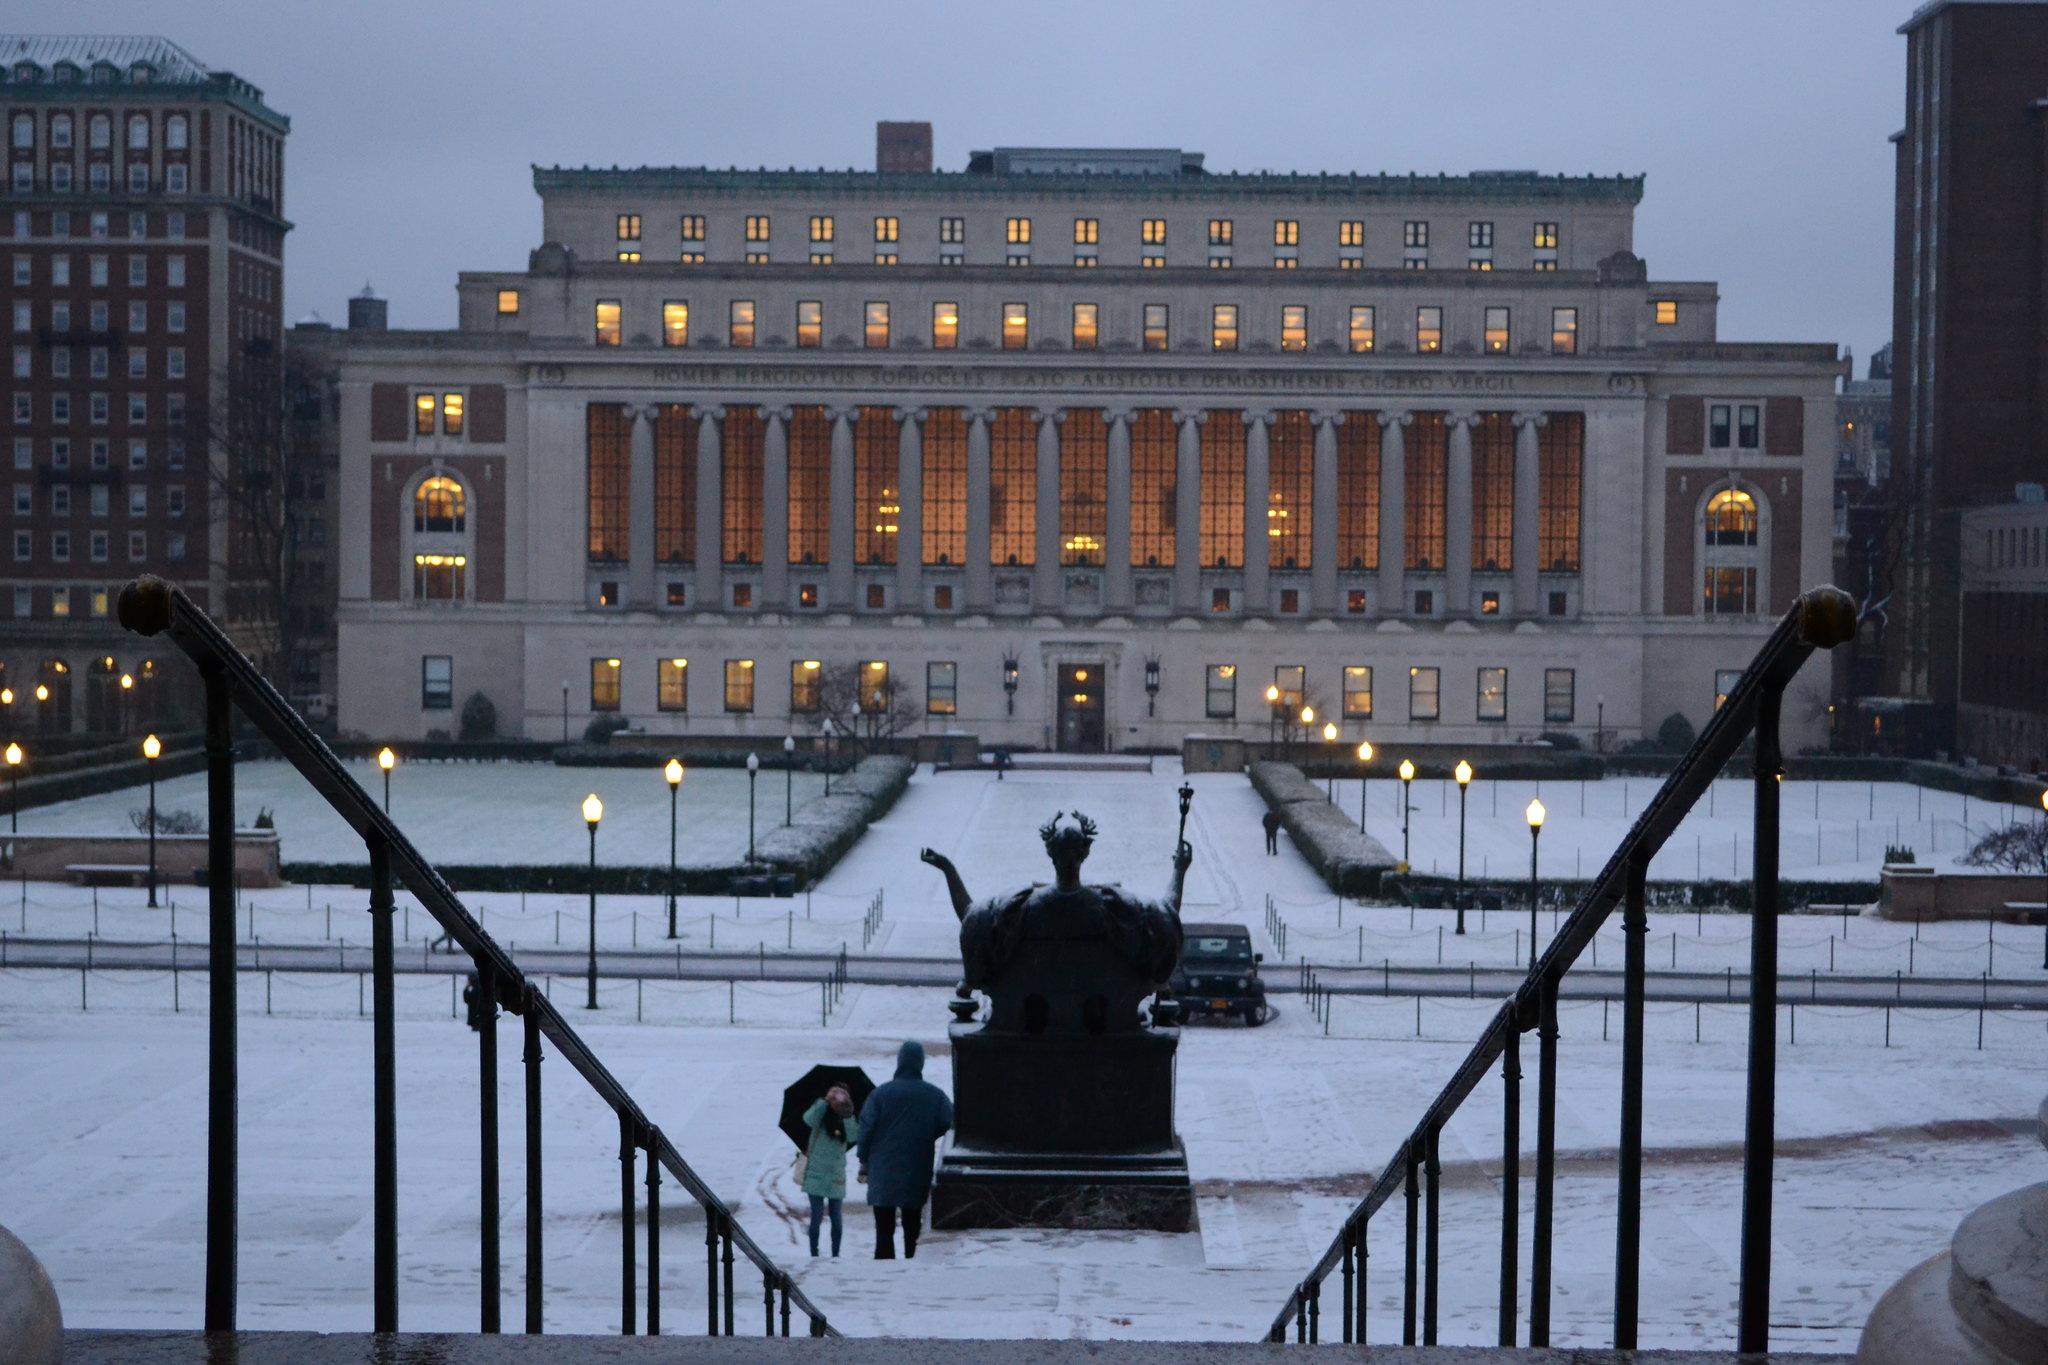 Tolle Columbia University Diplom Rahmen Ideen - Benutzerdefinierte ...